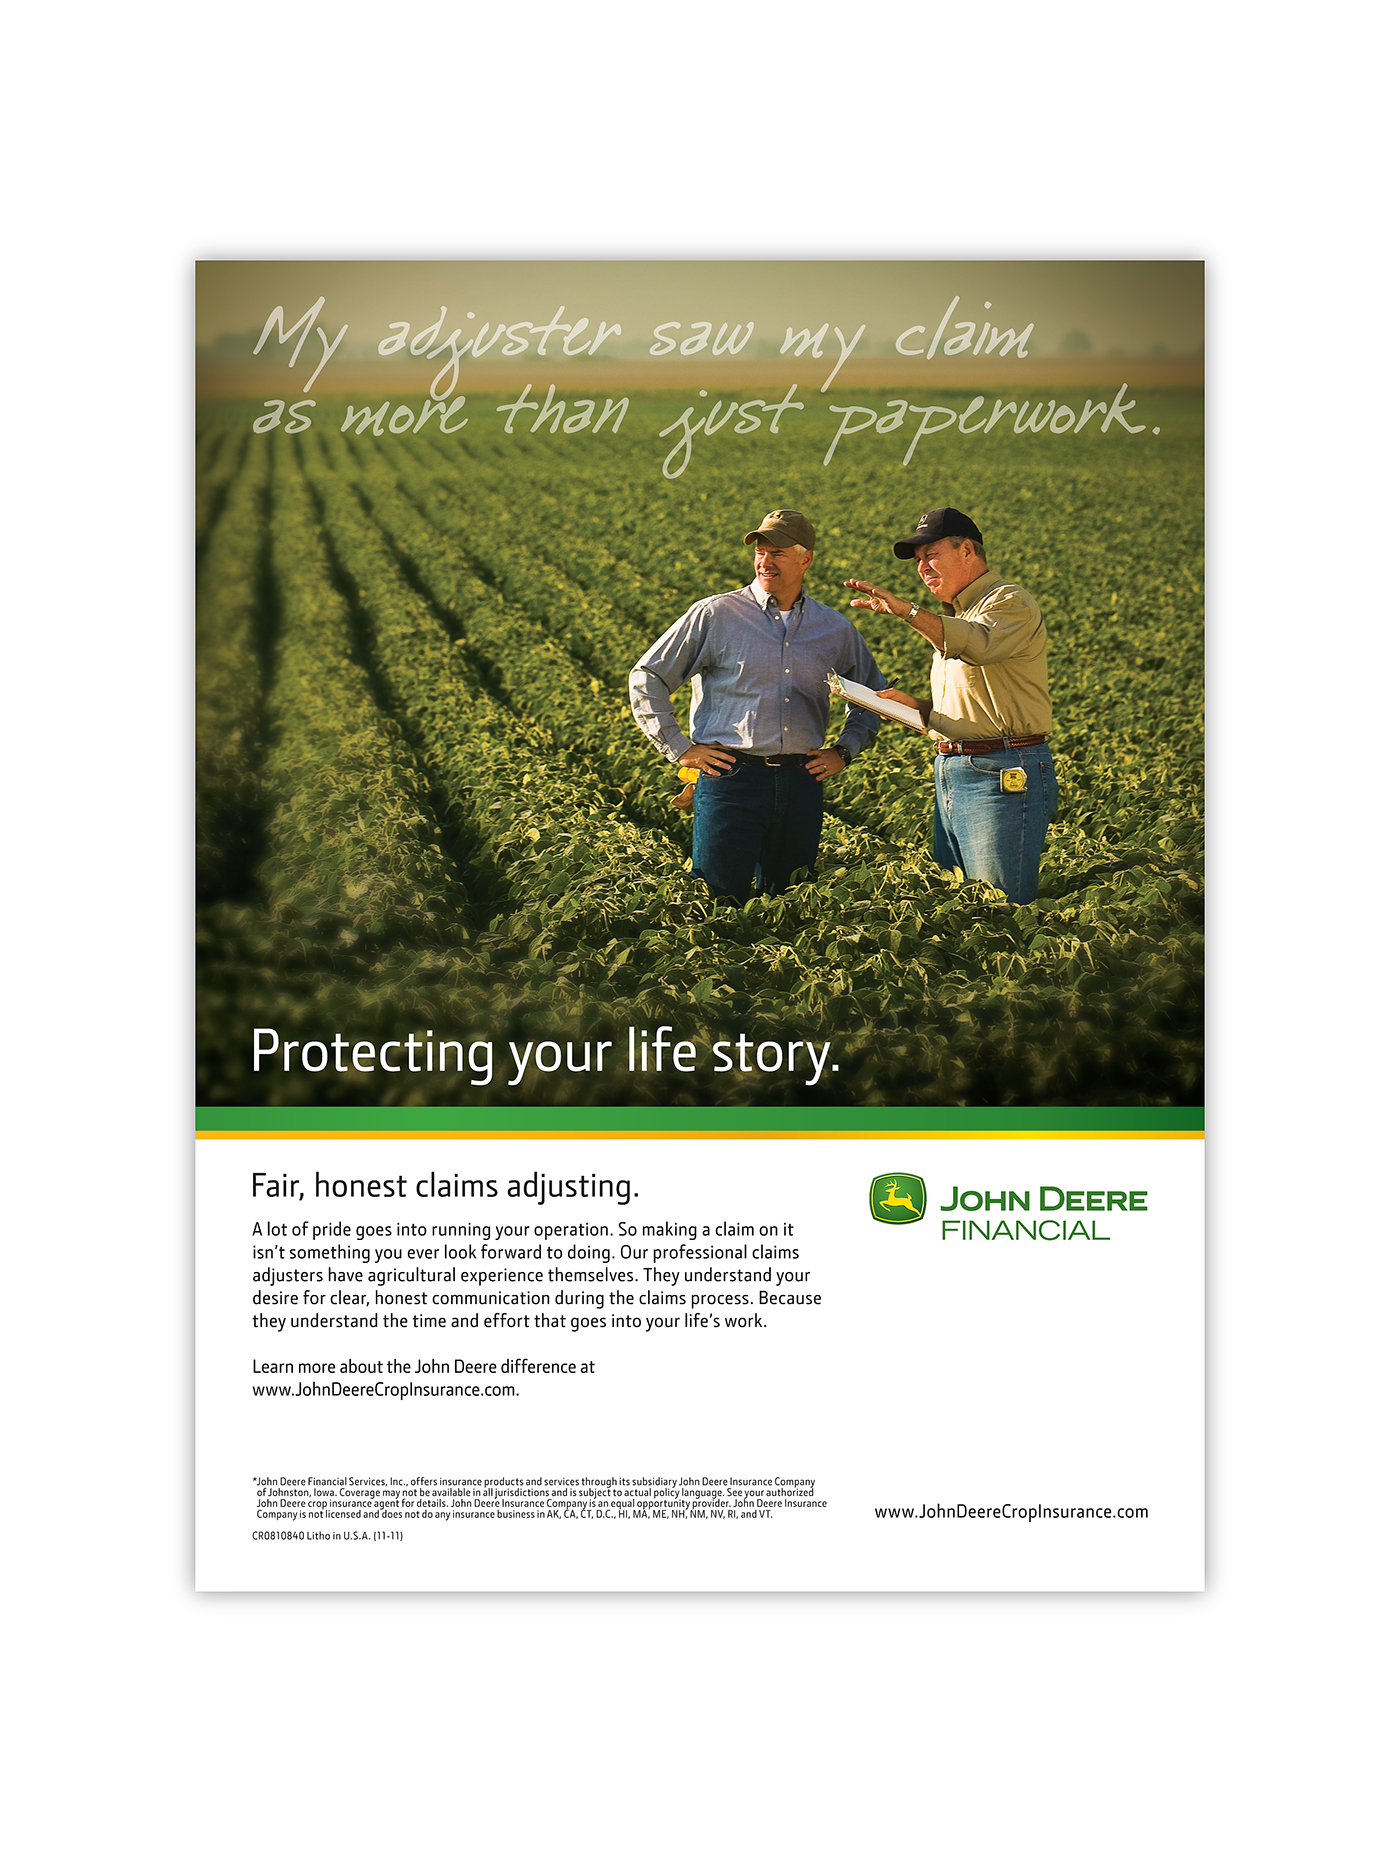 John Deere Financial - Life Story Campaign on Behance